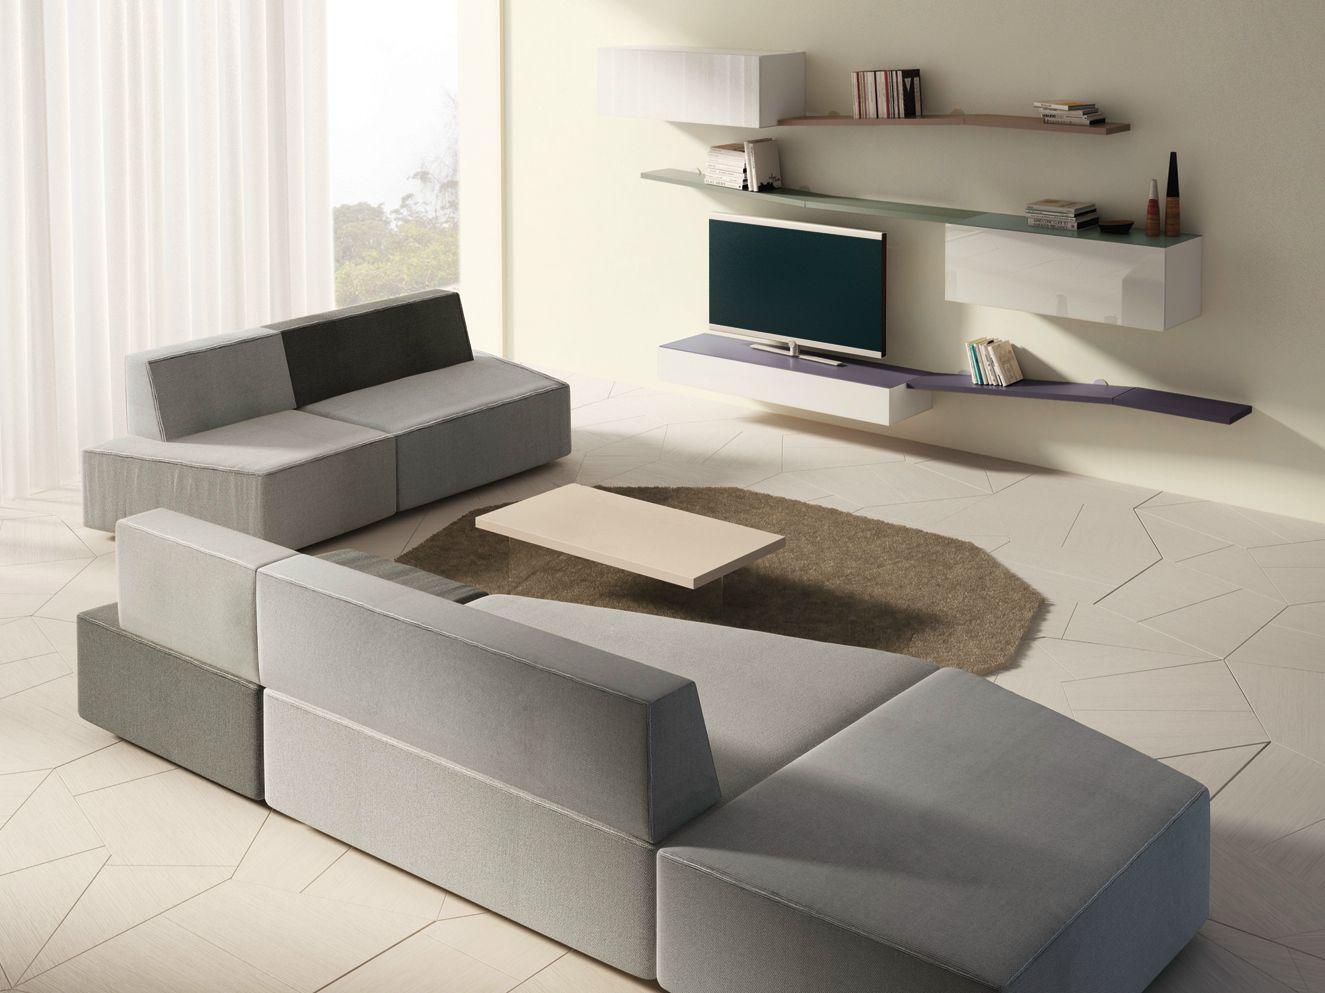 SLIDE Sofa by Lago design Daniele Lago | Sofa | Pinterest